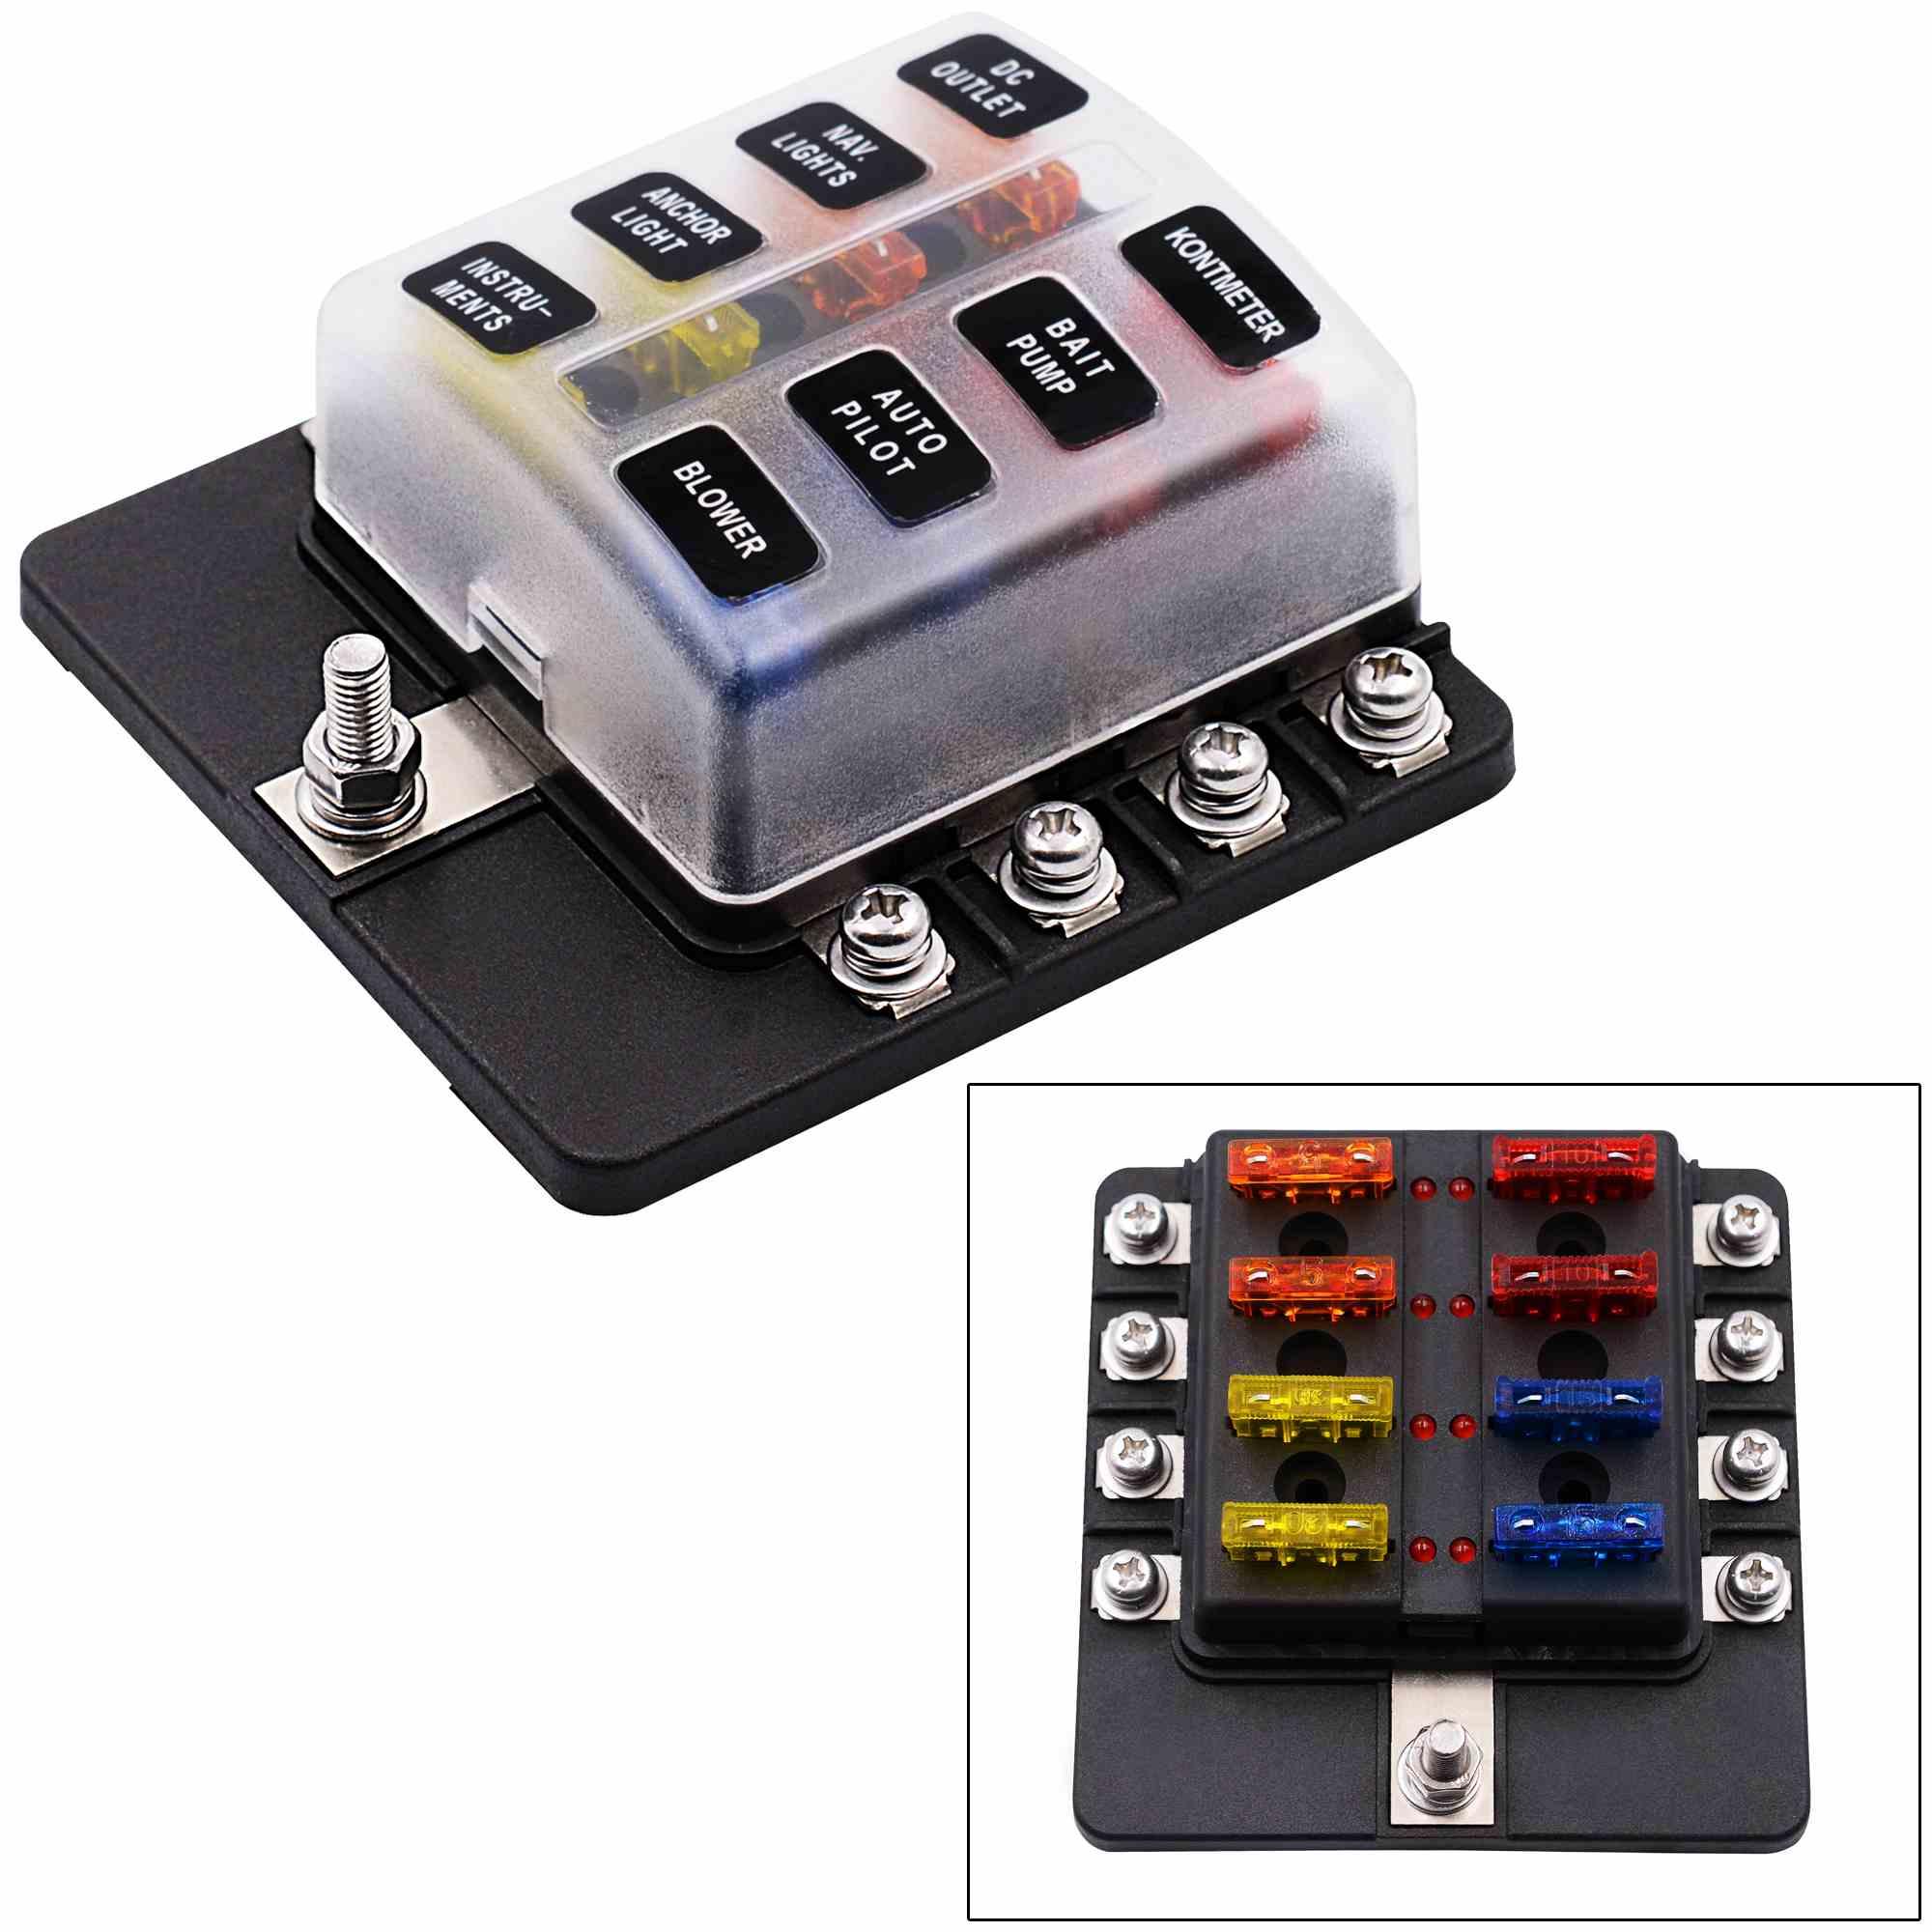 rl_3560] quickline 2 universal fuse box free diagram  mopar itive proe birdem trons mohammedshrine librar wiring 101